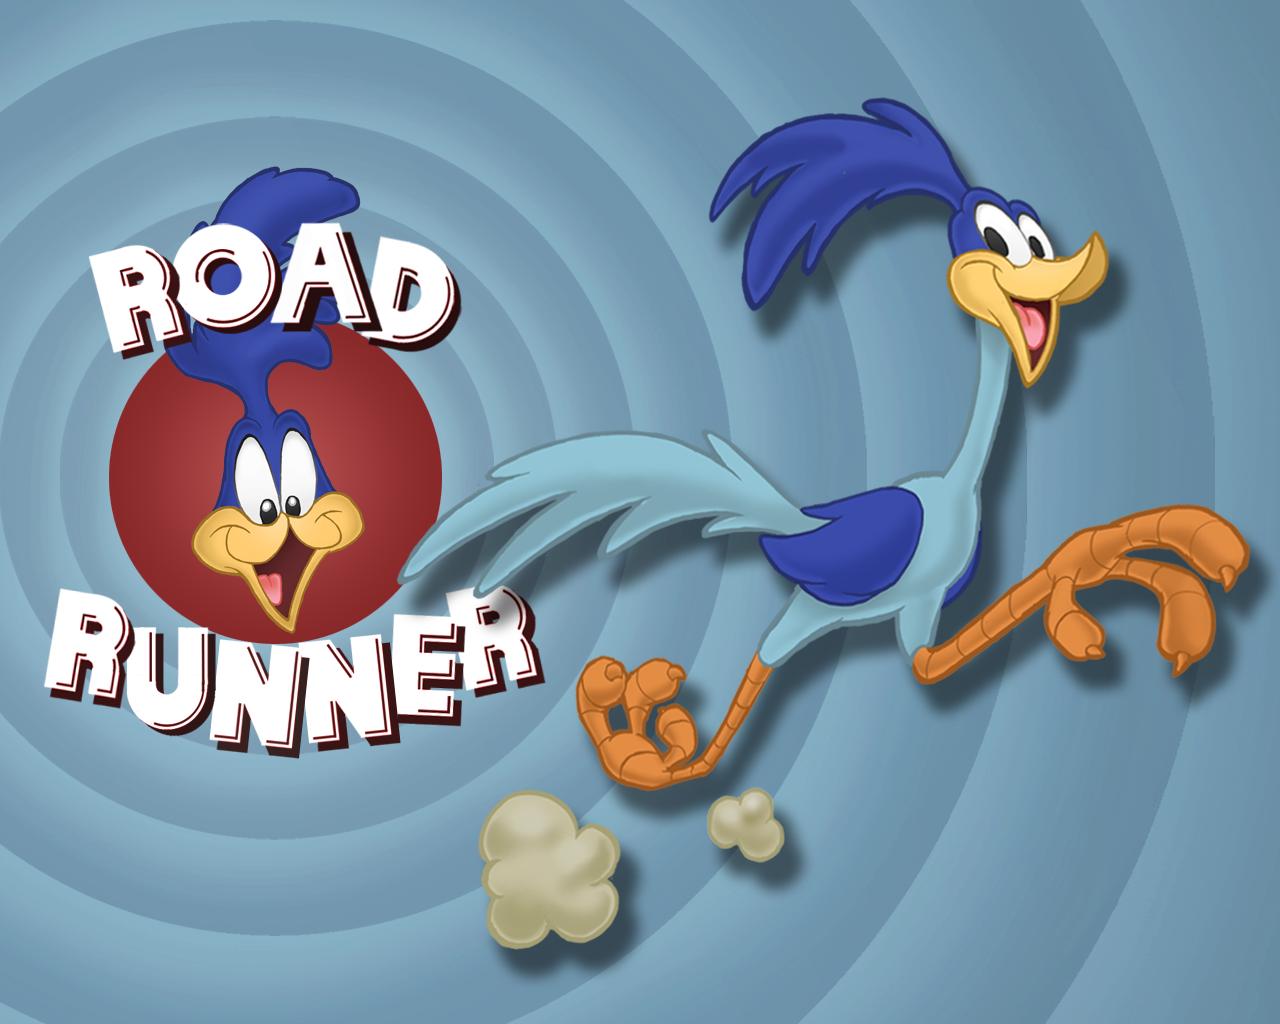 Road runner cartoon wallpaper cartoon images - Pics of road runner ...